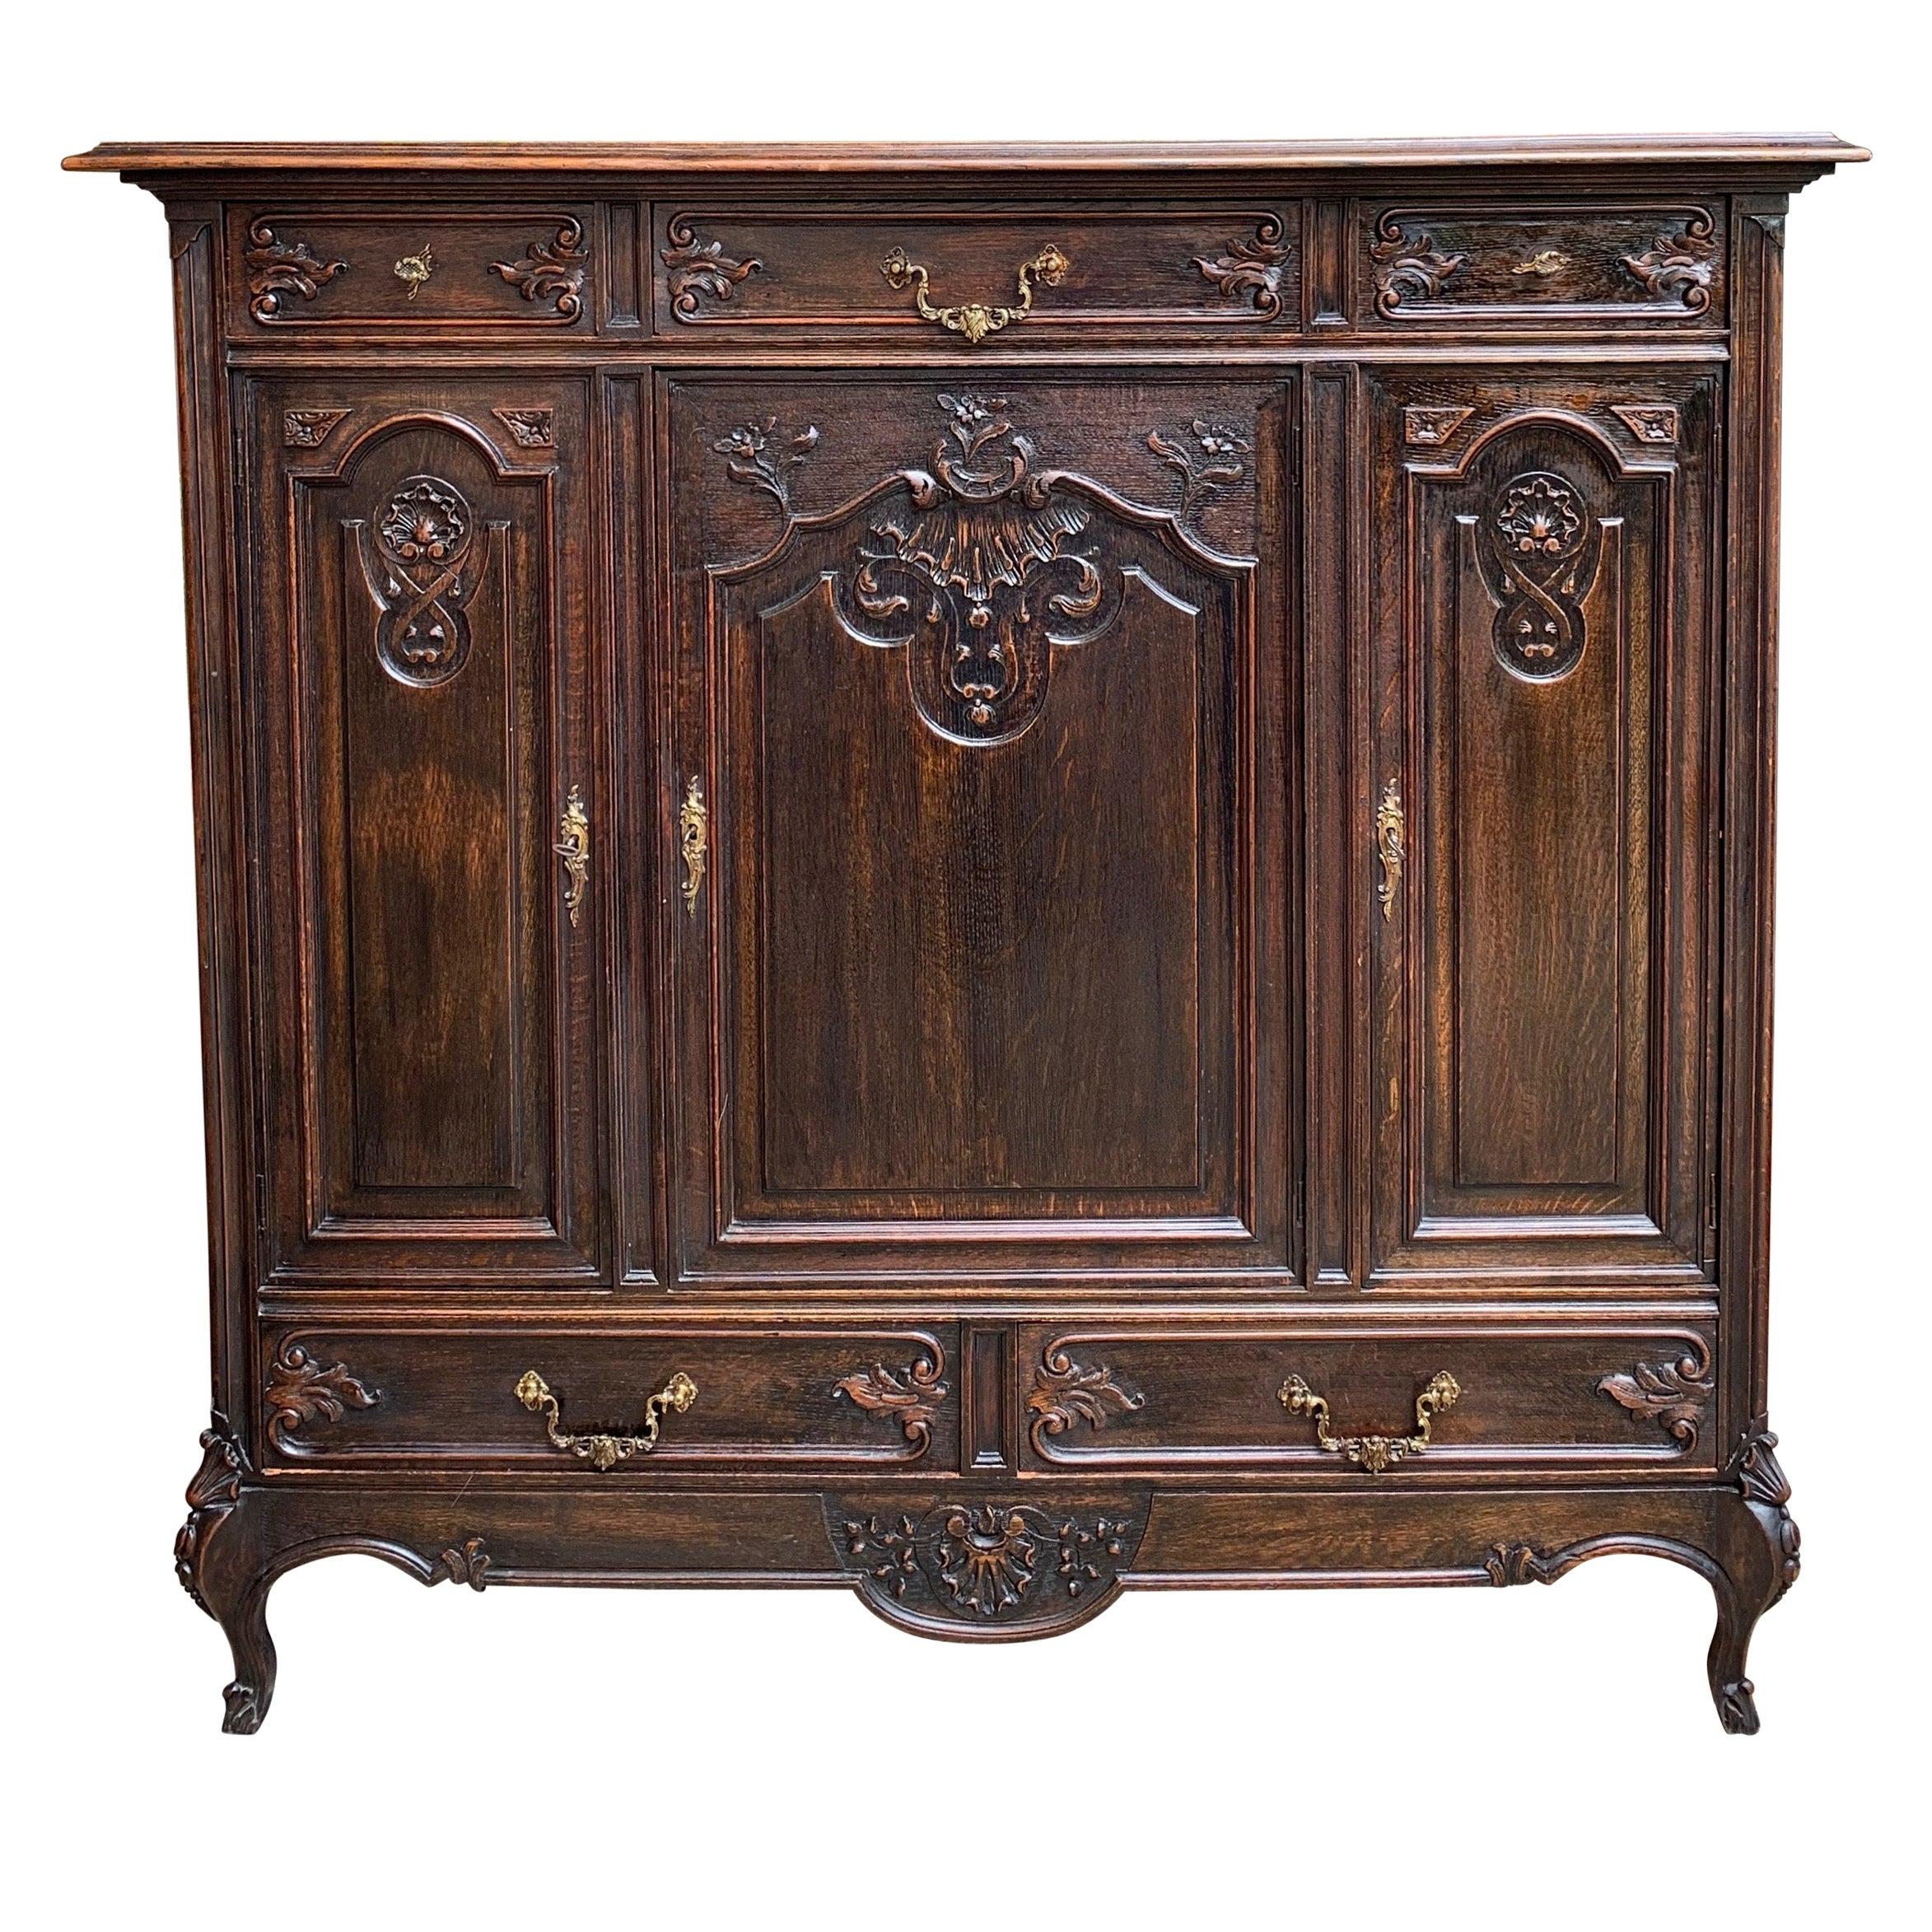 Antique French Carved Dark Oak Sideboard Dresser Cabinet Louis XV Style 'B'